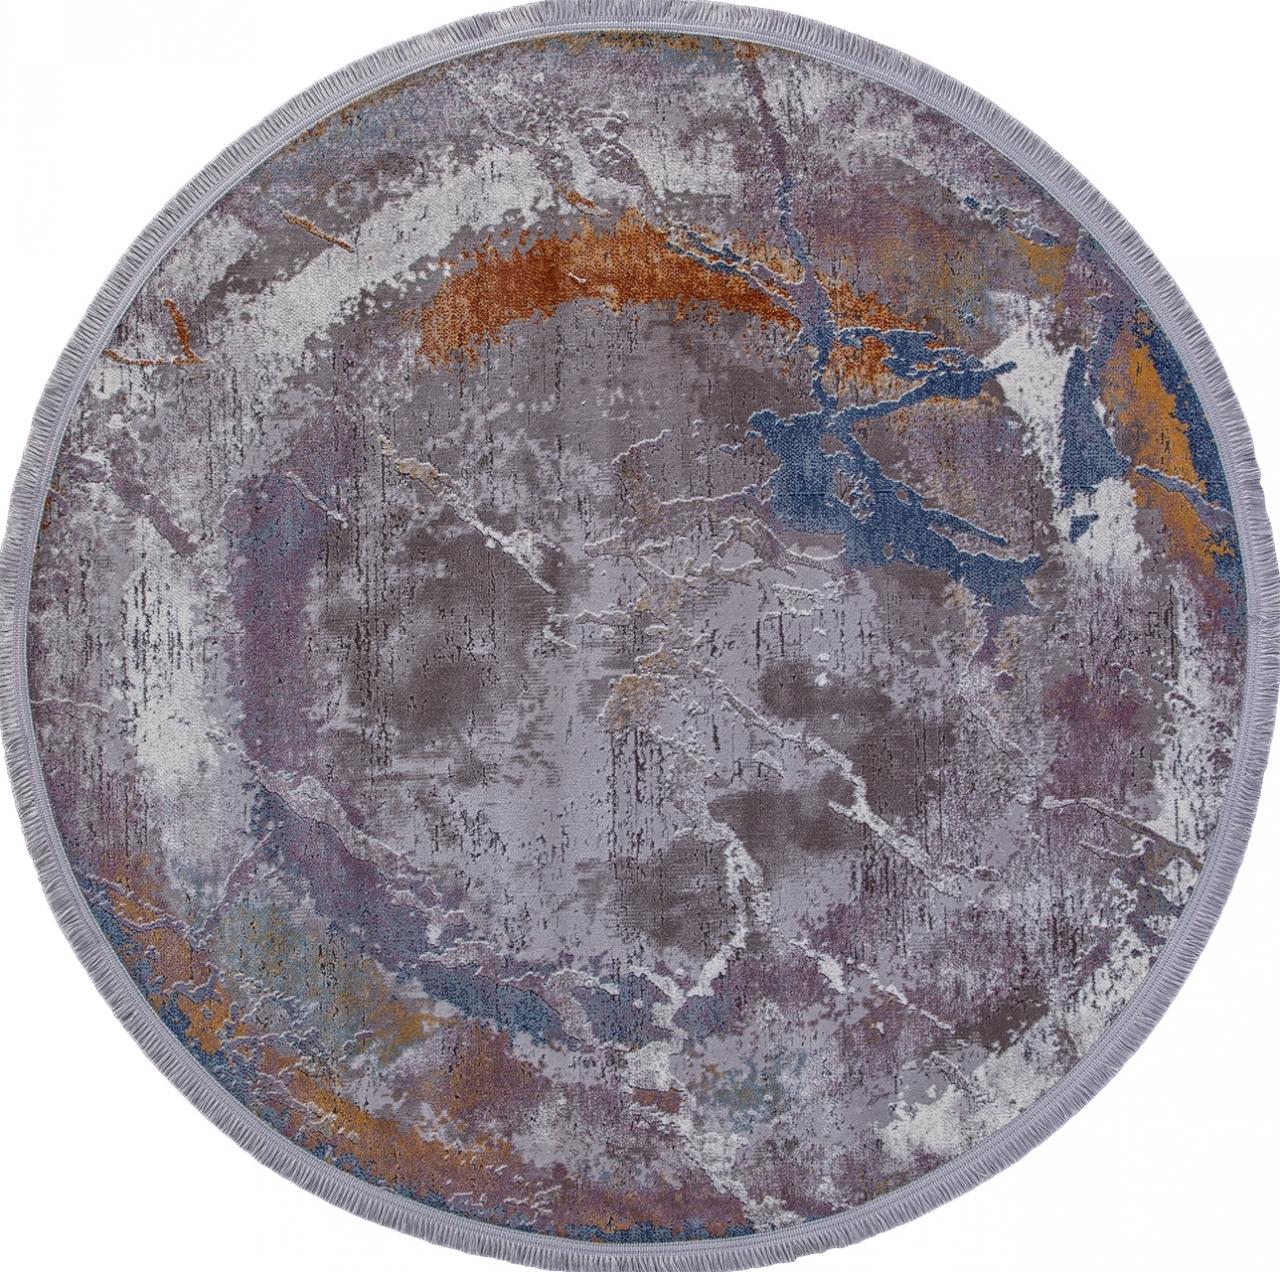 Ковер 05708G - GREY / GREY - Овал - коллекция RIM - фото 2